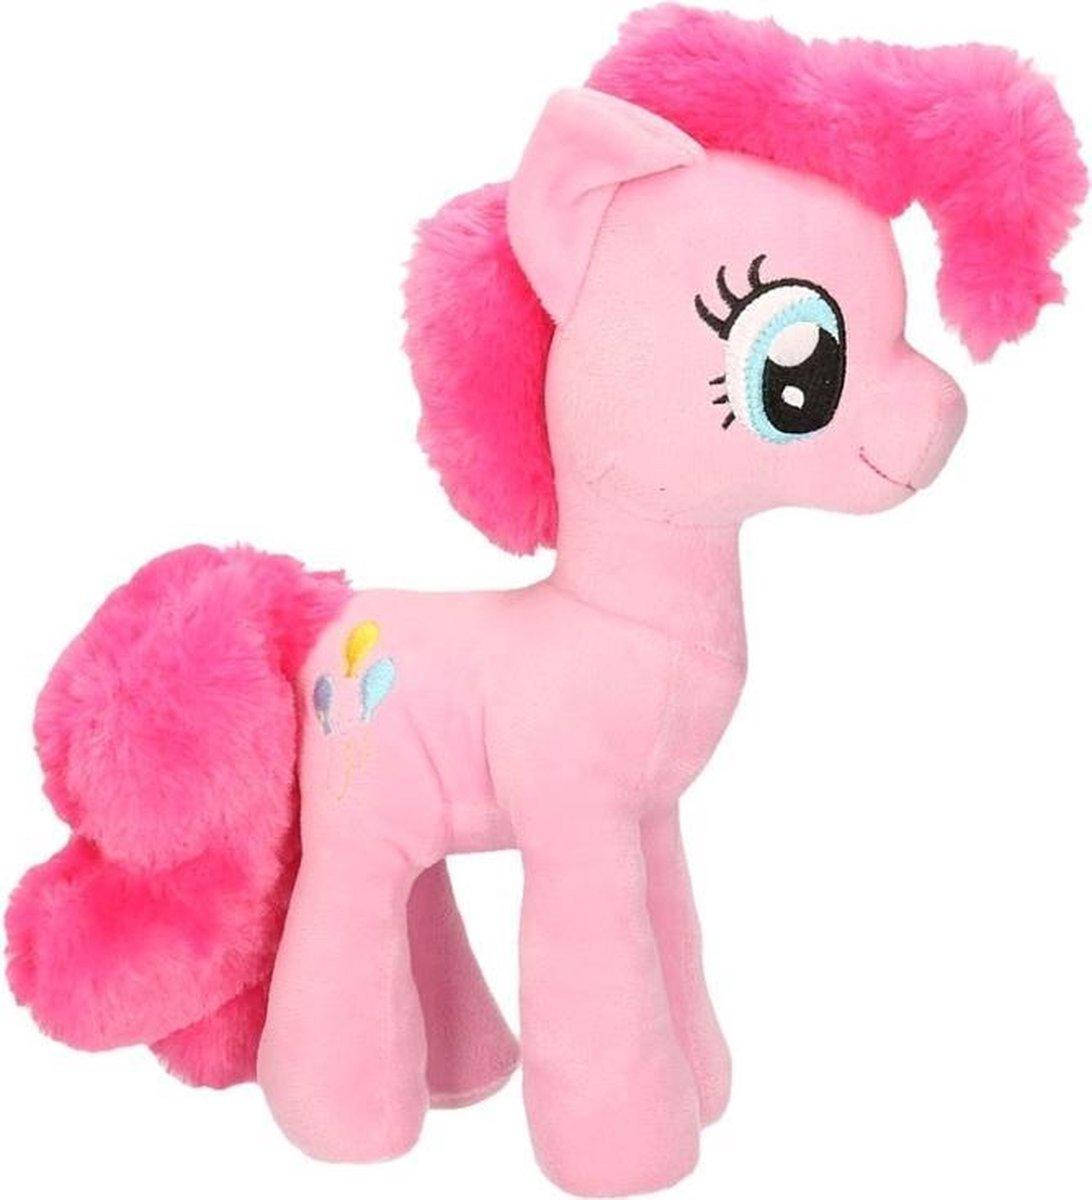 My Little Pony Pluche Knuffel 30 cm geleverd per stuk - My Little Pony